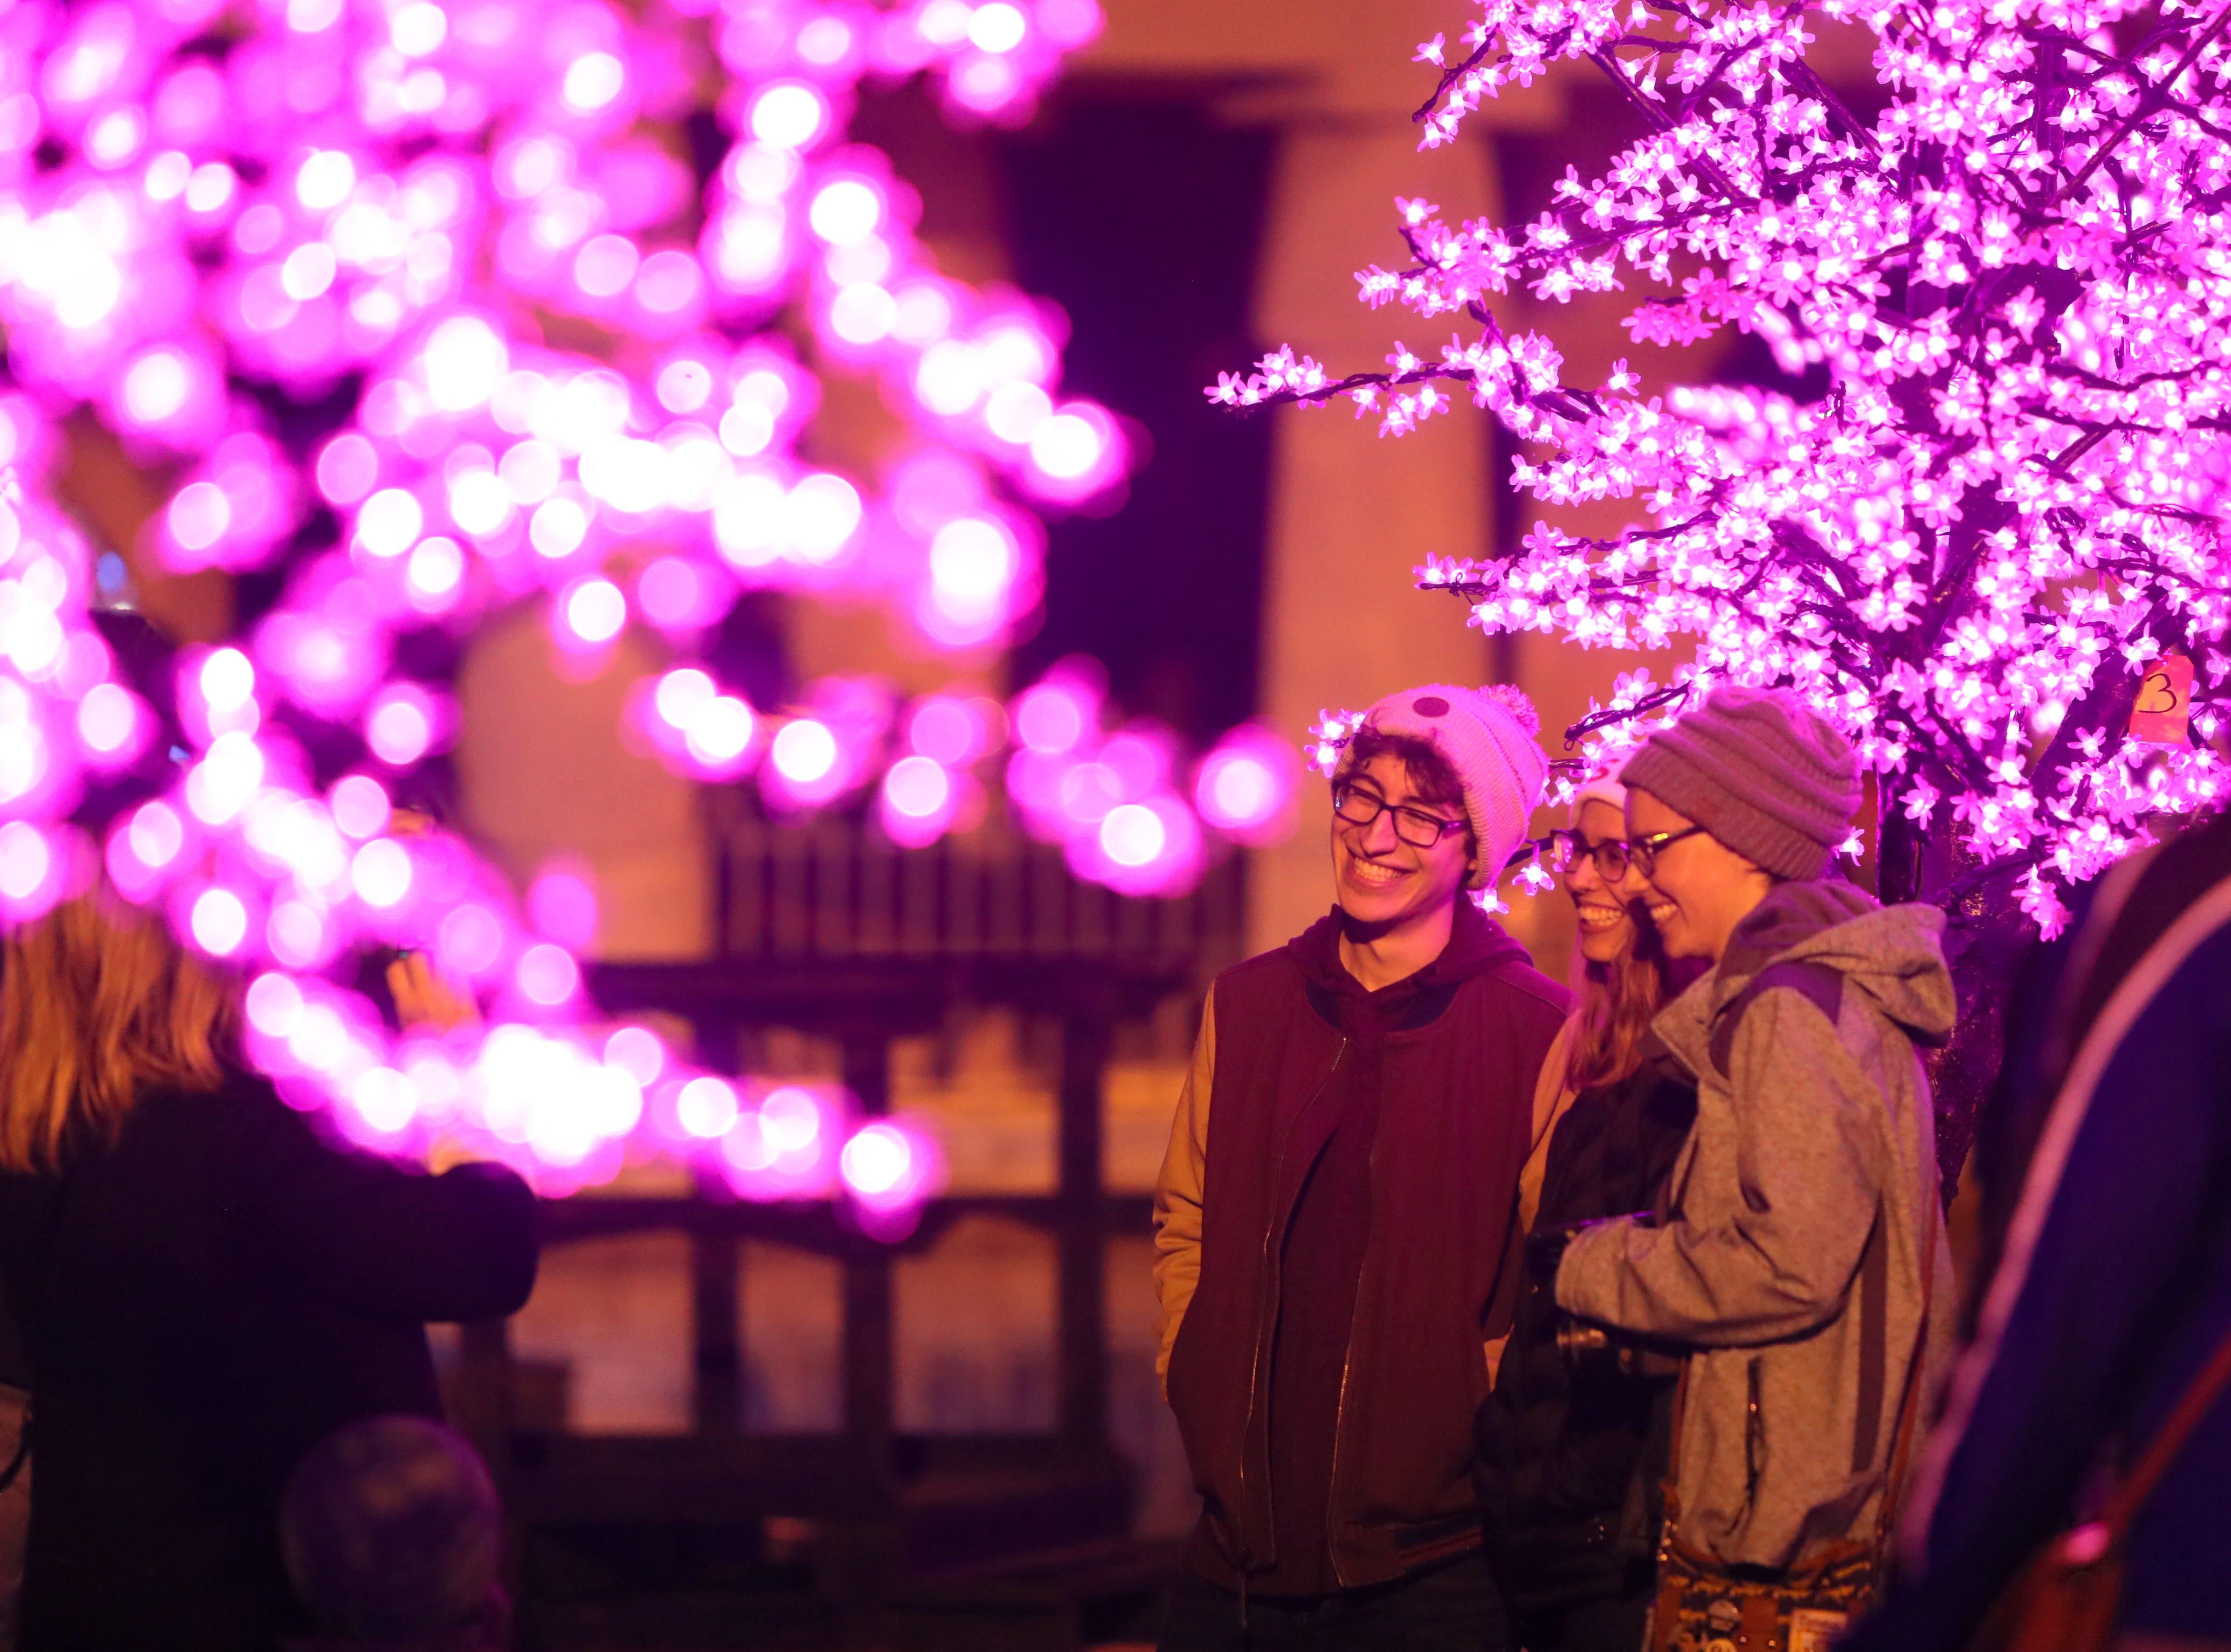 Zoo Lights, a holiday season event at the Memphis Zoo Saturday, Nov. 24, 2018.